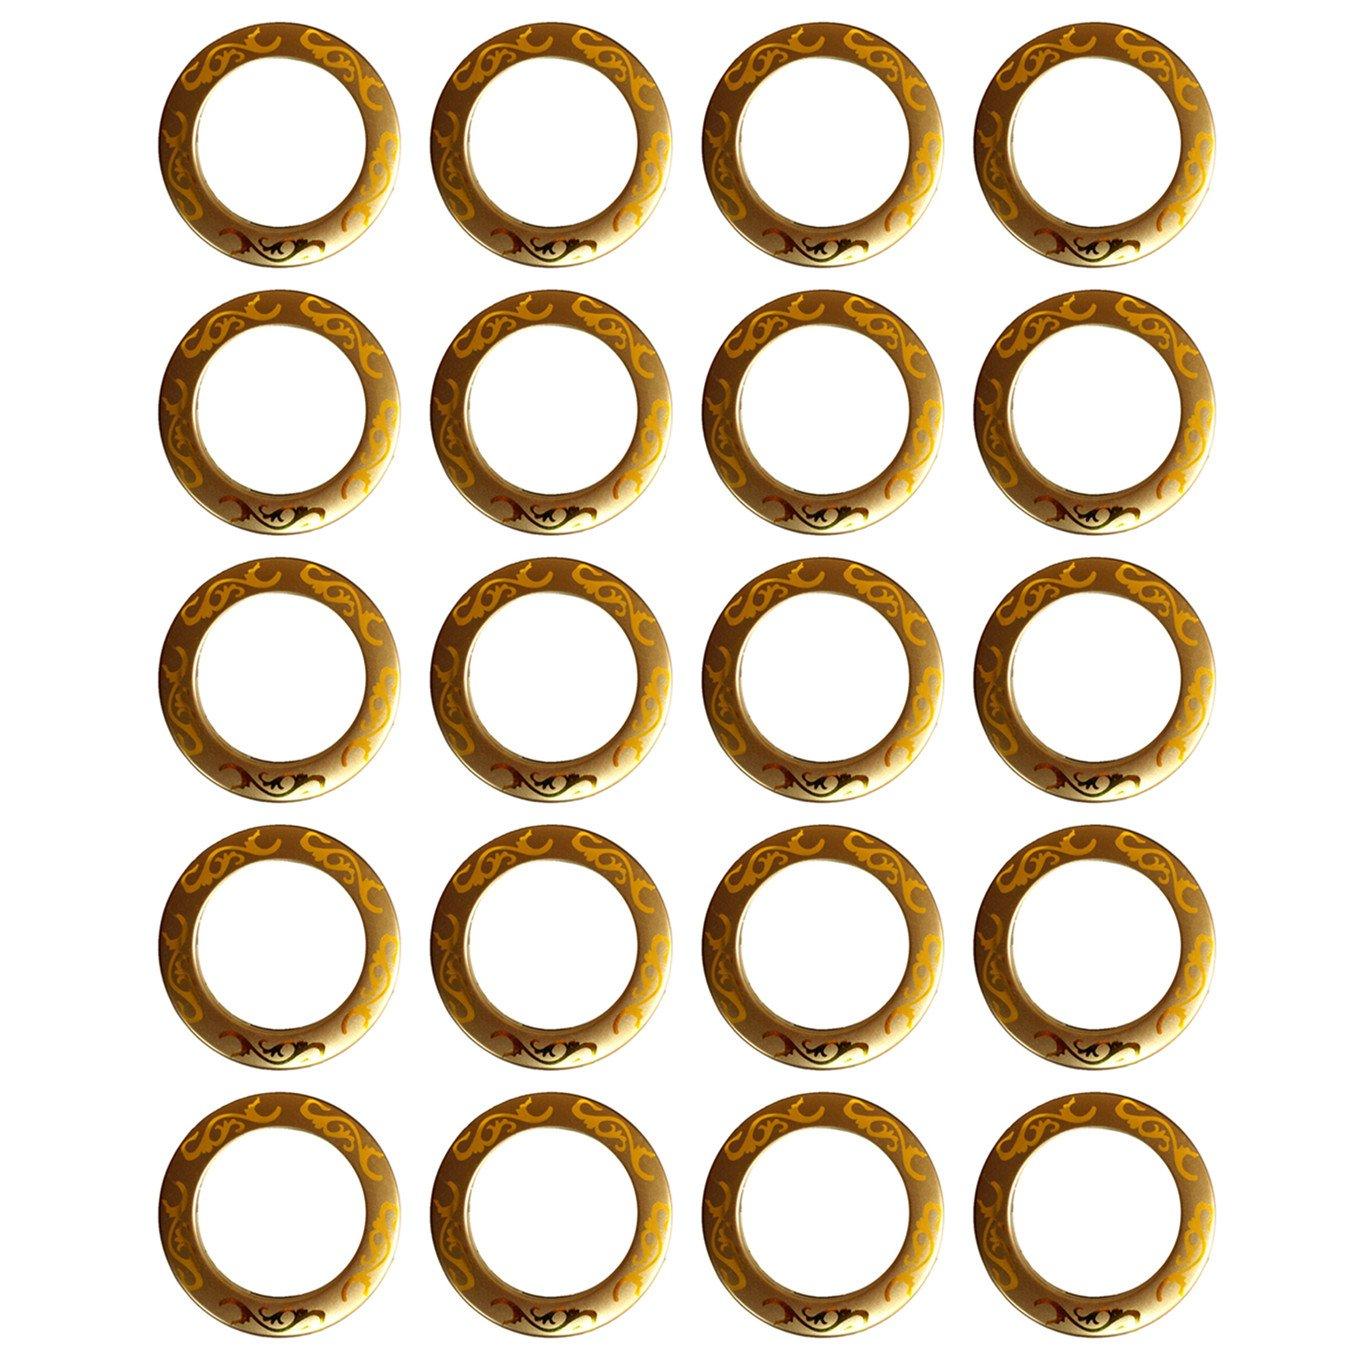 Selling Wonderful 20-Pack 1-9/16-Inch Inner Diameter Curtain Grommets Style2 (Gold)